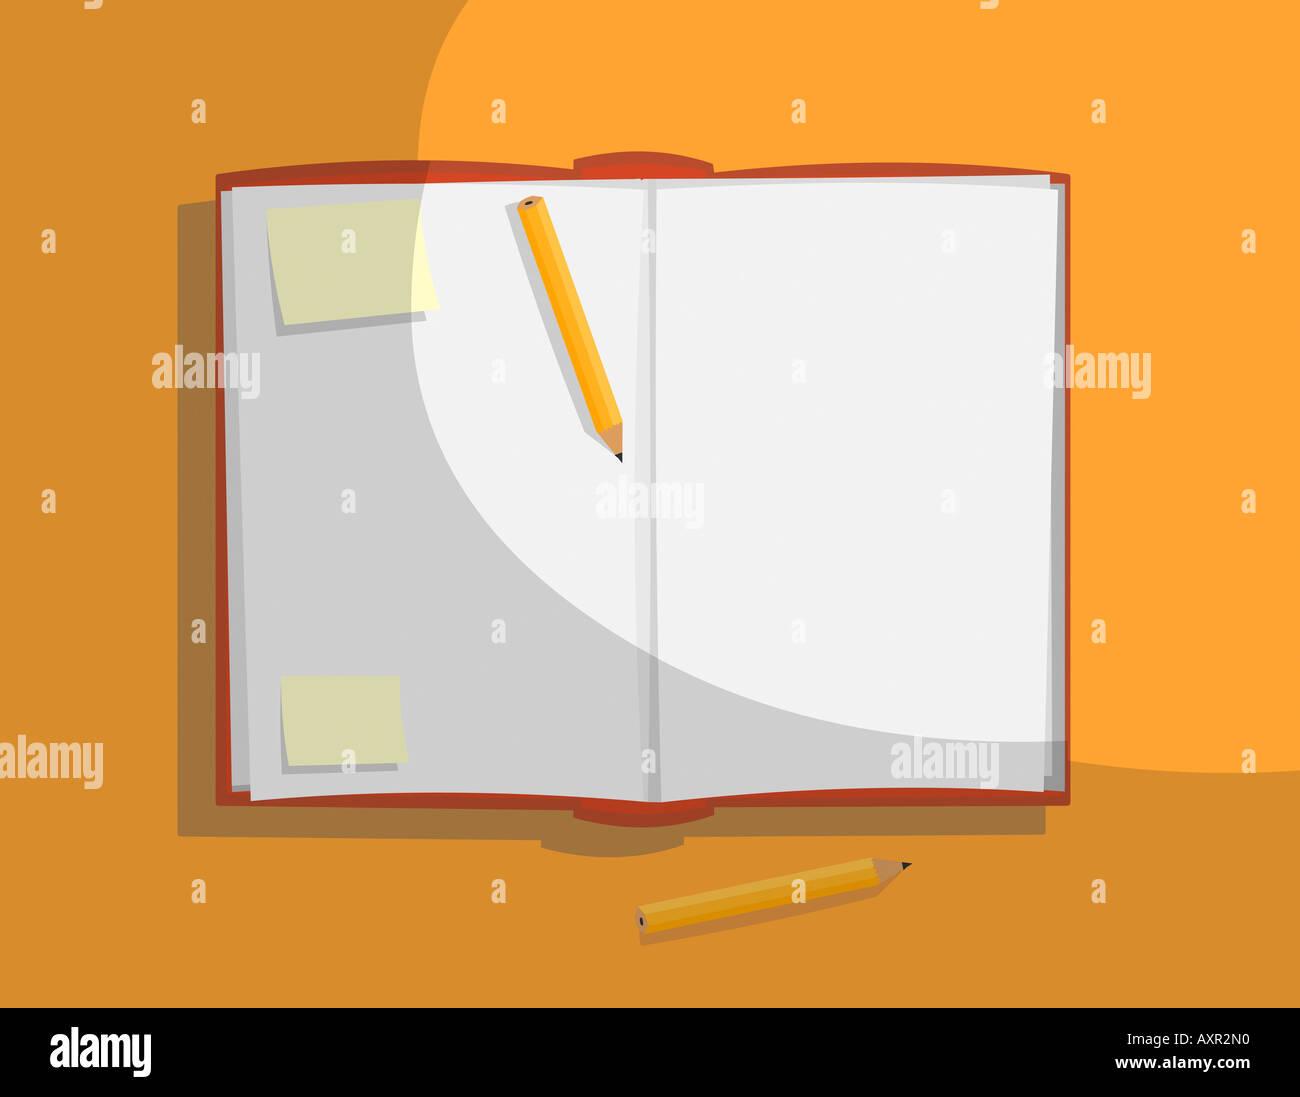 Open book illustration - Stock Image